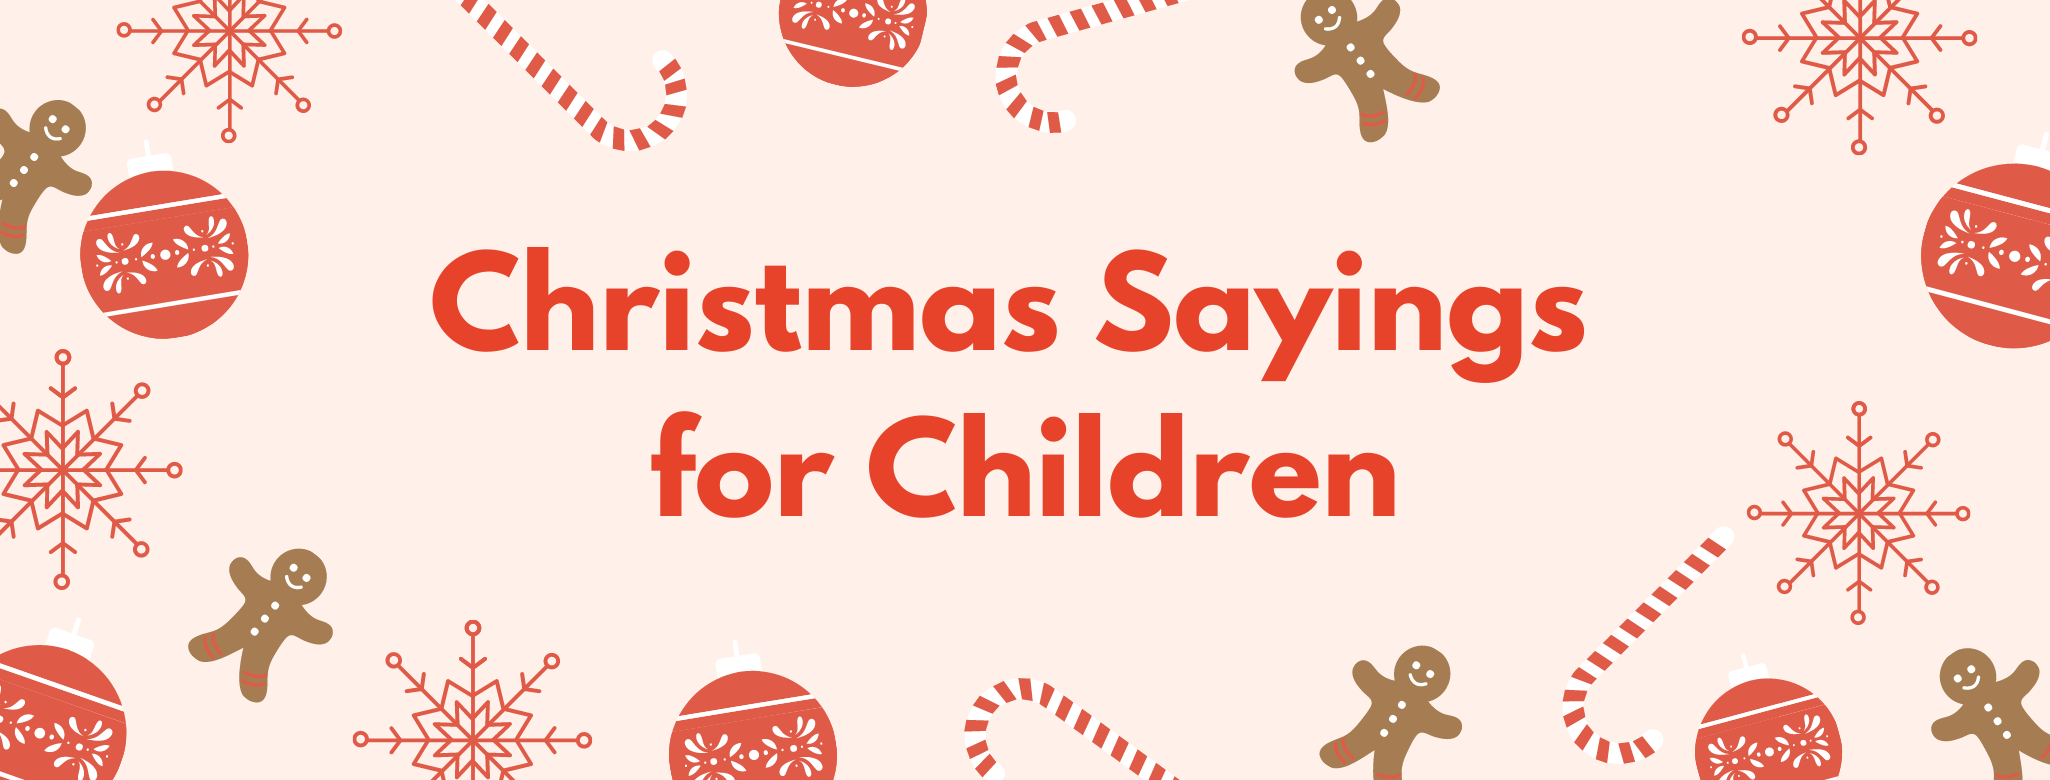 Christmas Sayings for Children